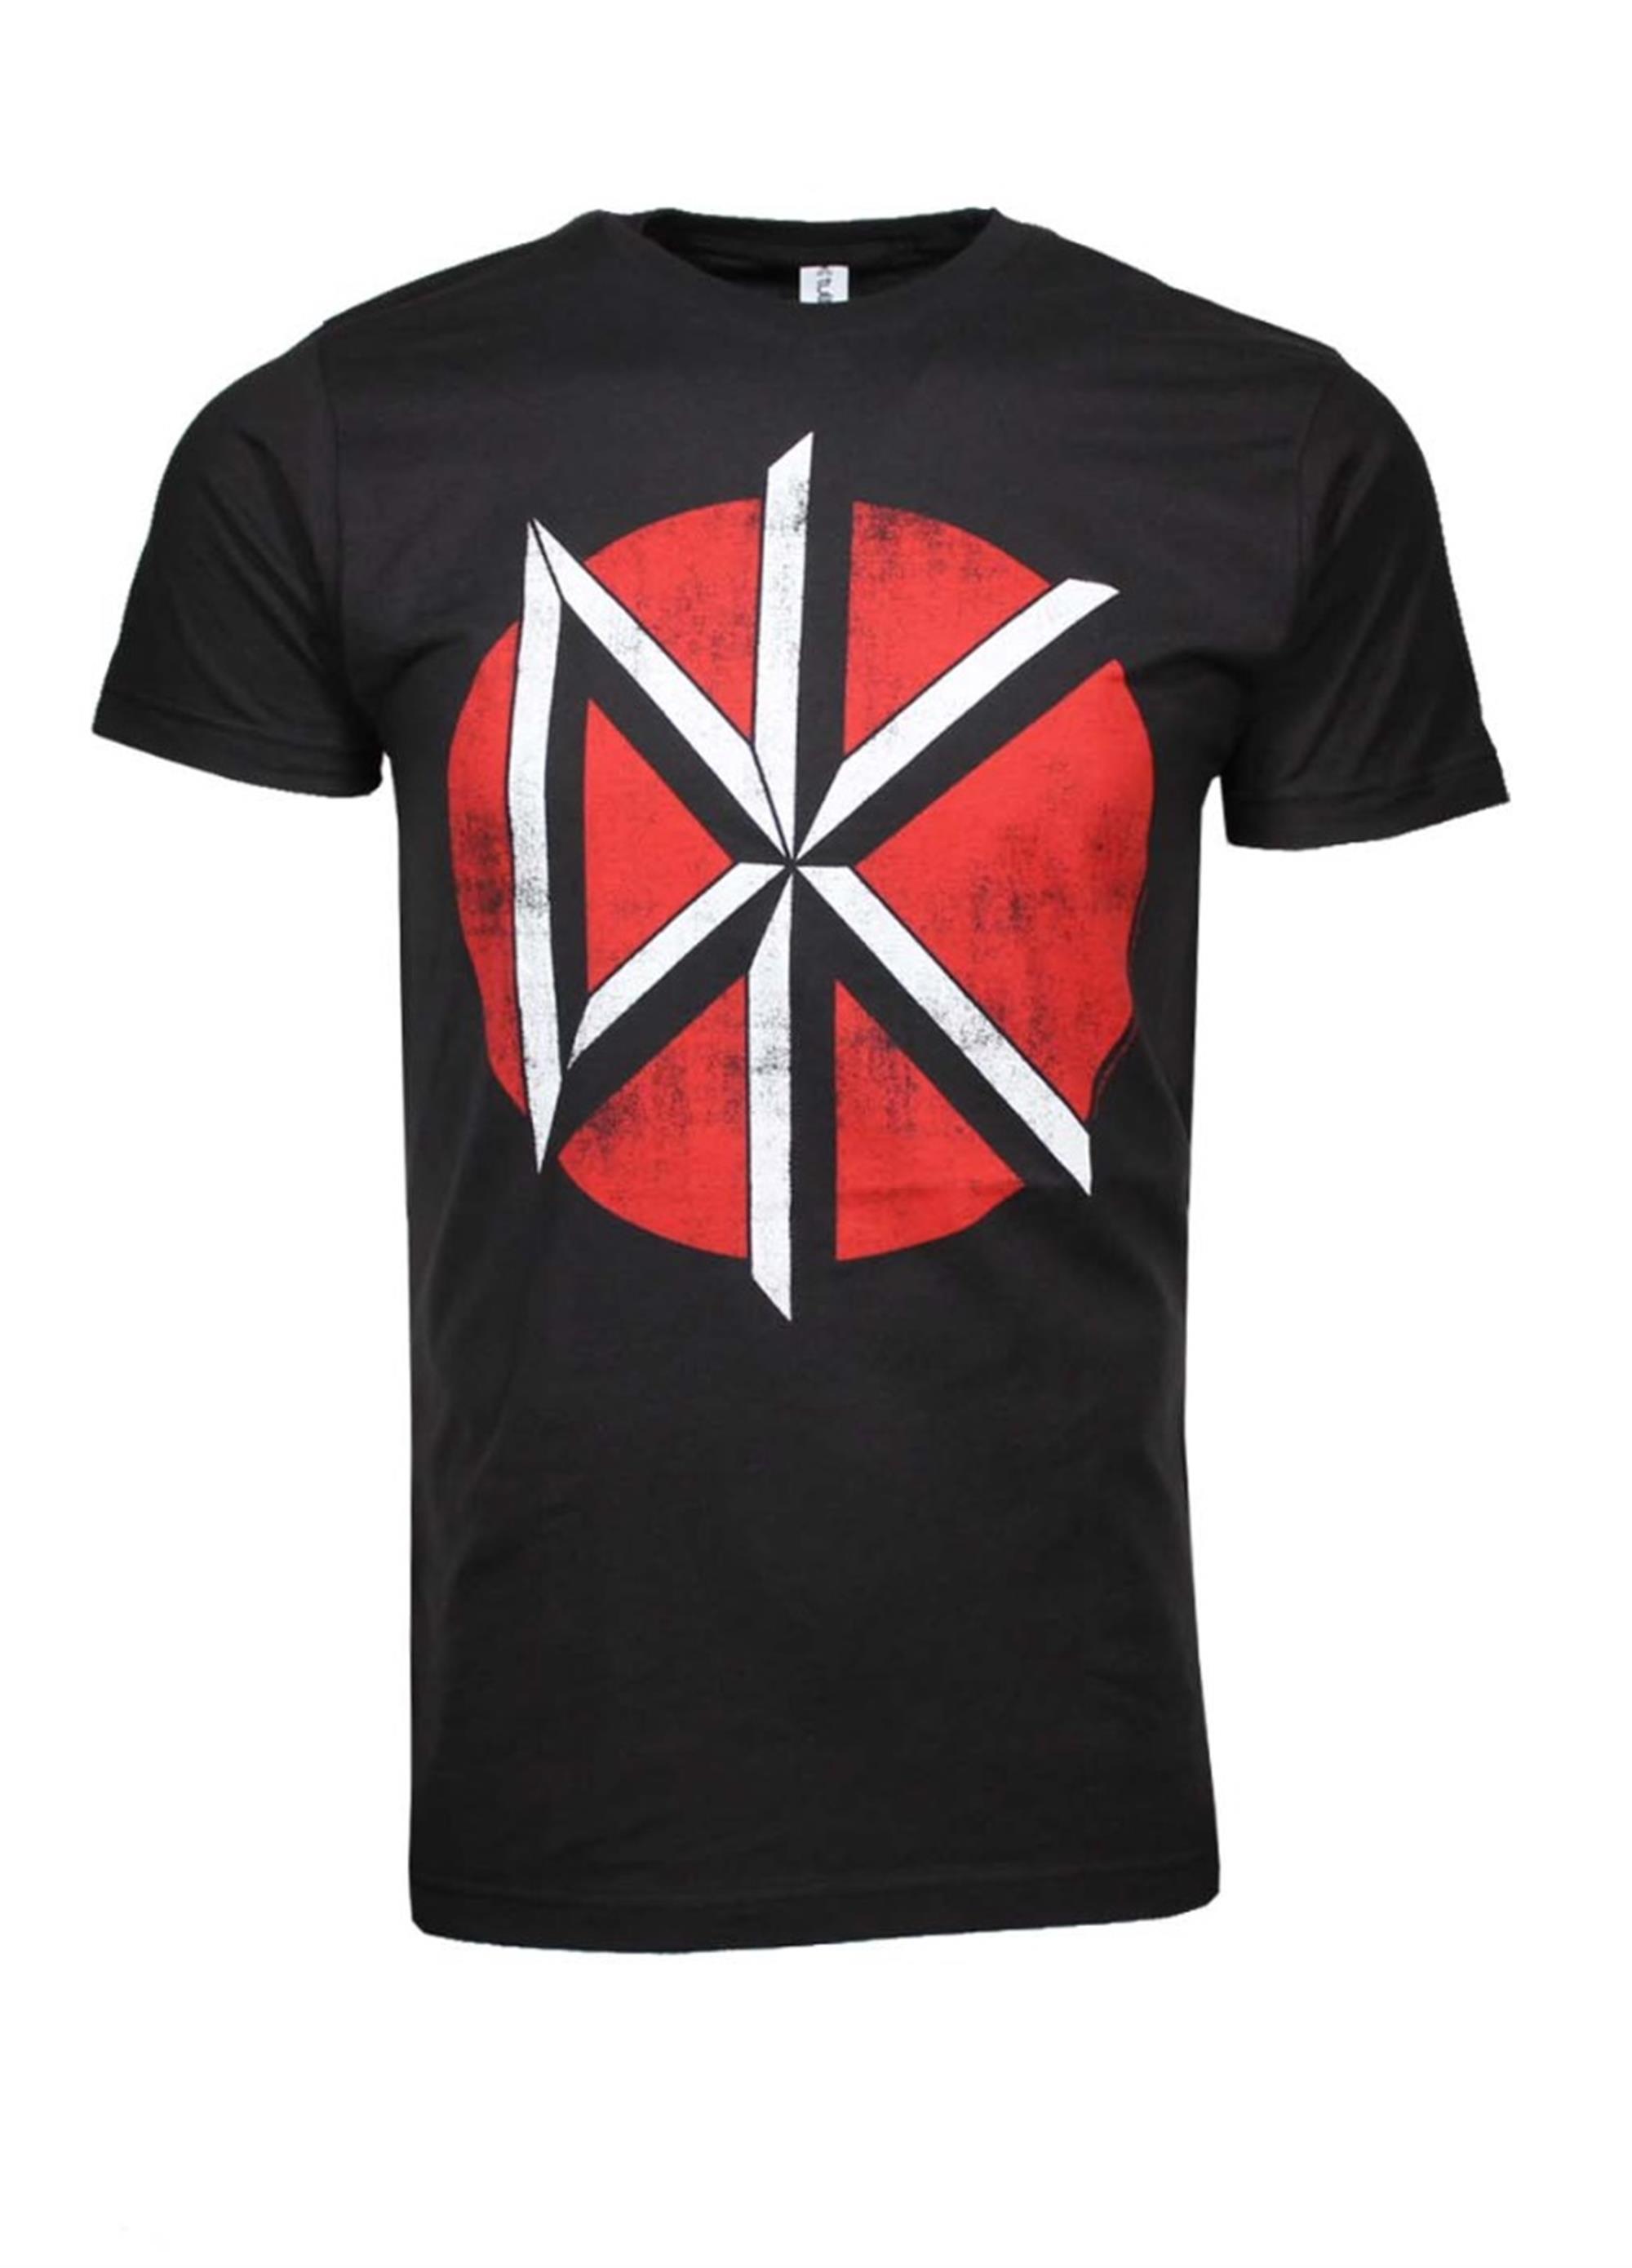 Dead Kennedys Distressed Logo T-Shirt